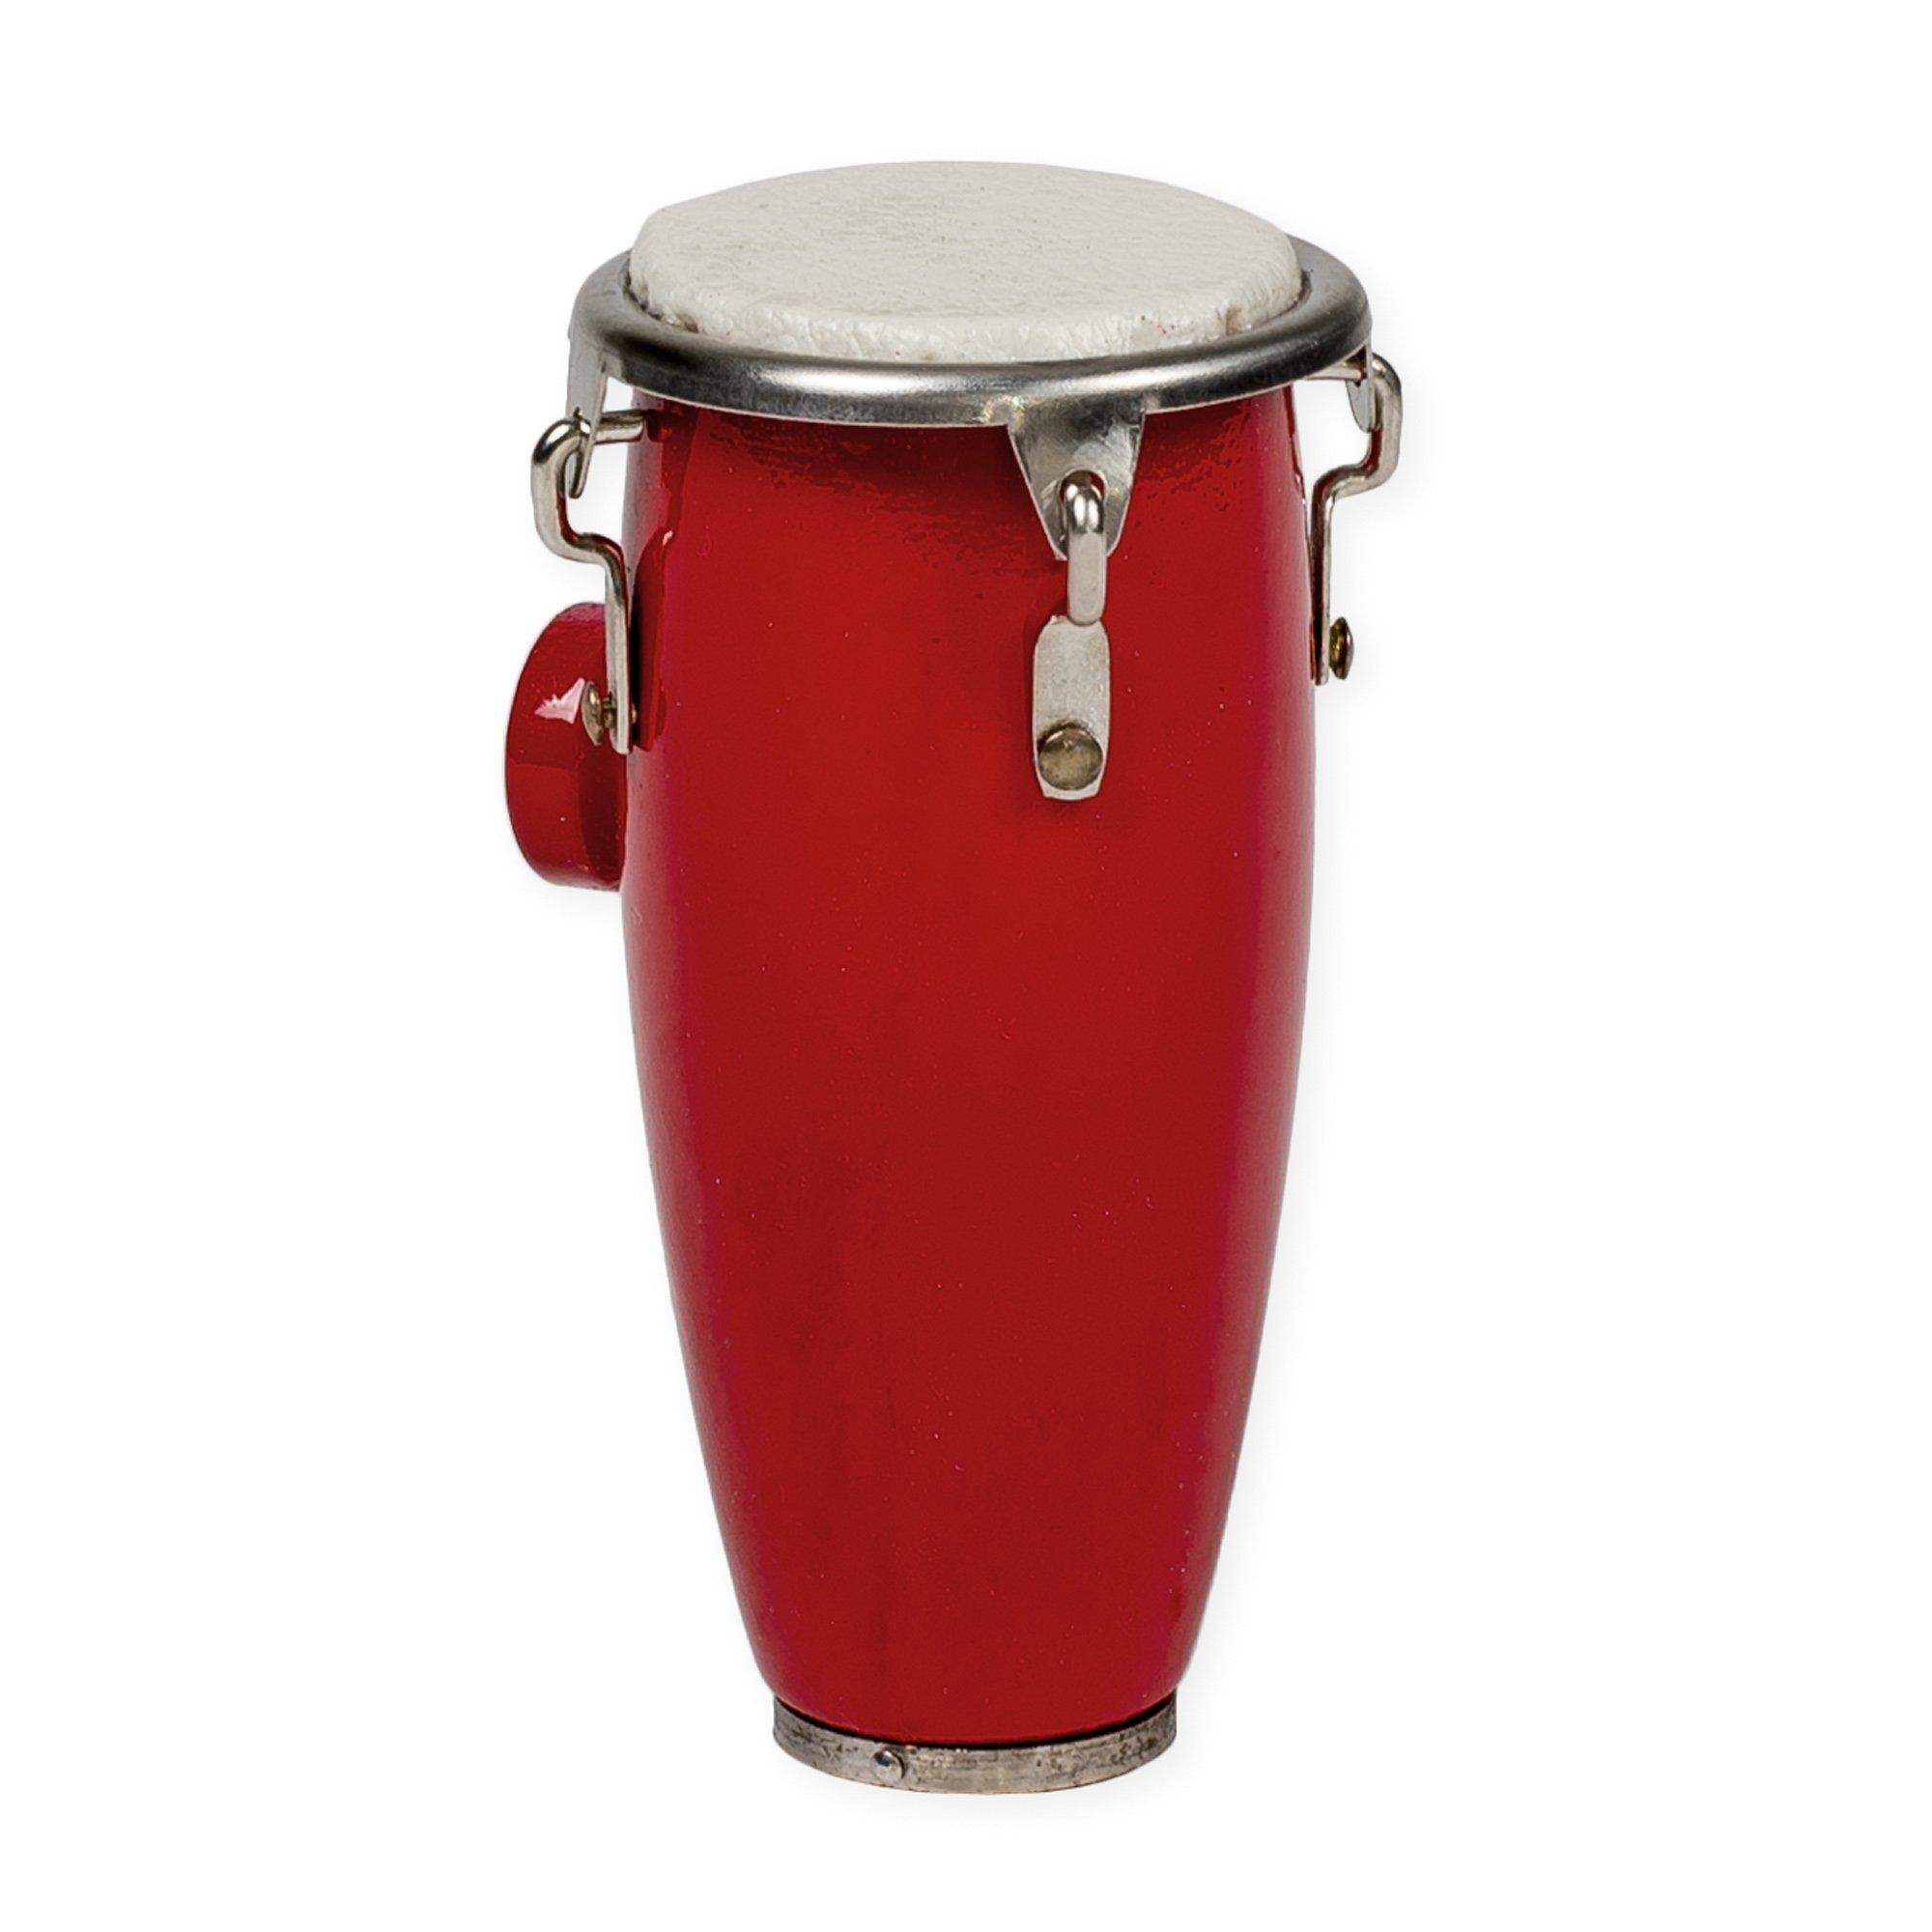 Conga Drum Miniature Replica Mahogany Tone 2 x 2.5